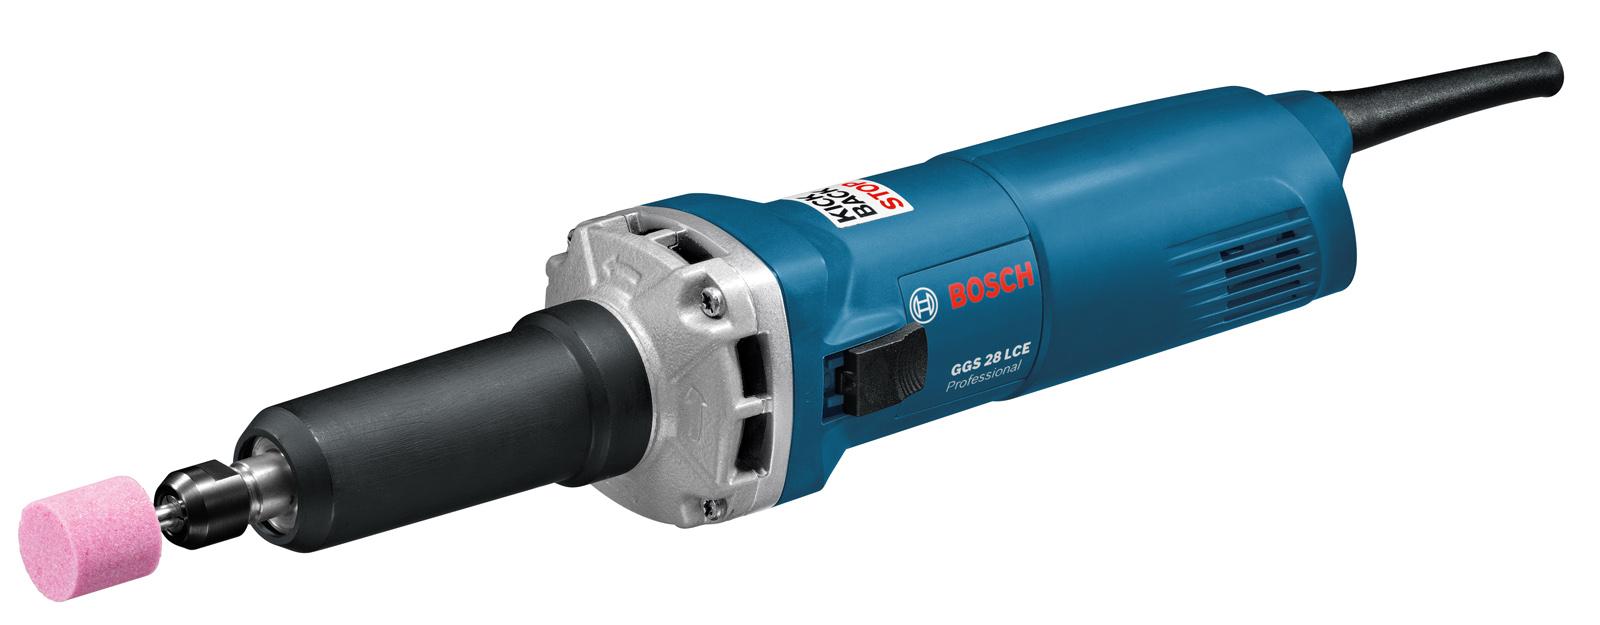 Машинка шлифовальная прямая Bosch Ggs 28 lce (0.601.221.100) гравер bosch ggs 28 lce professional